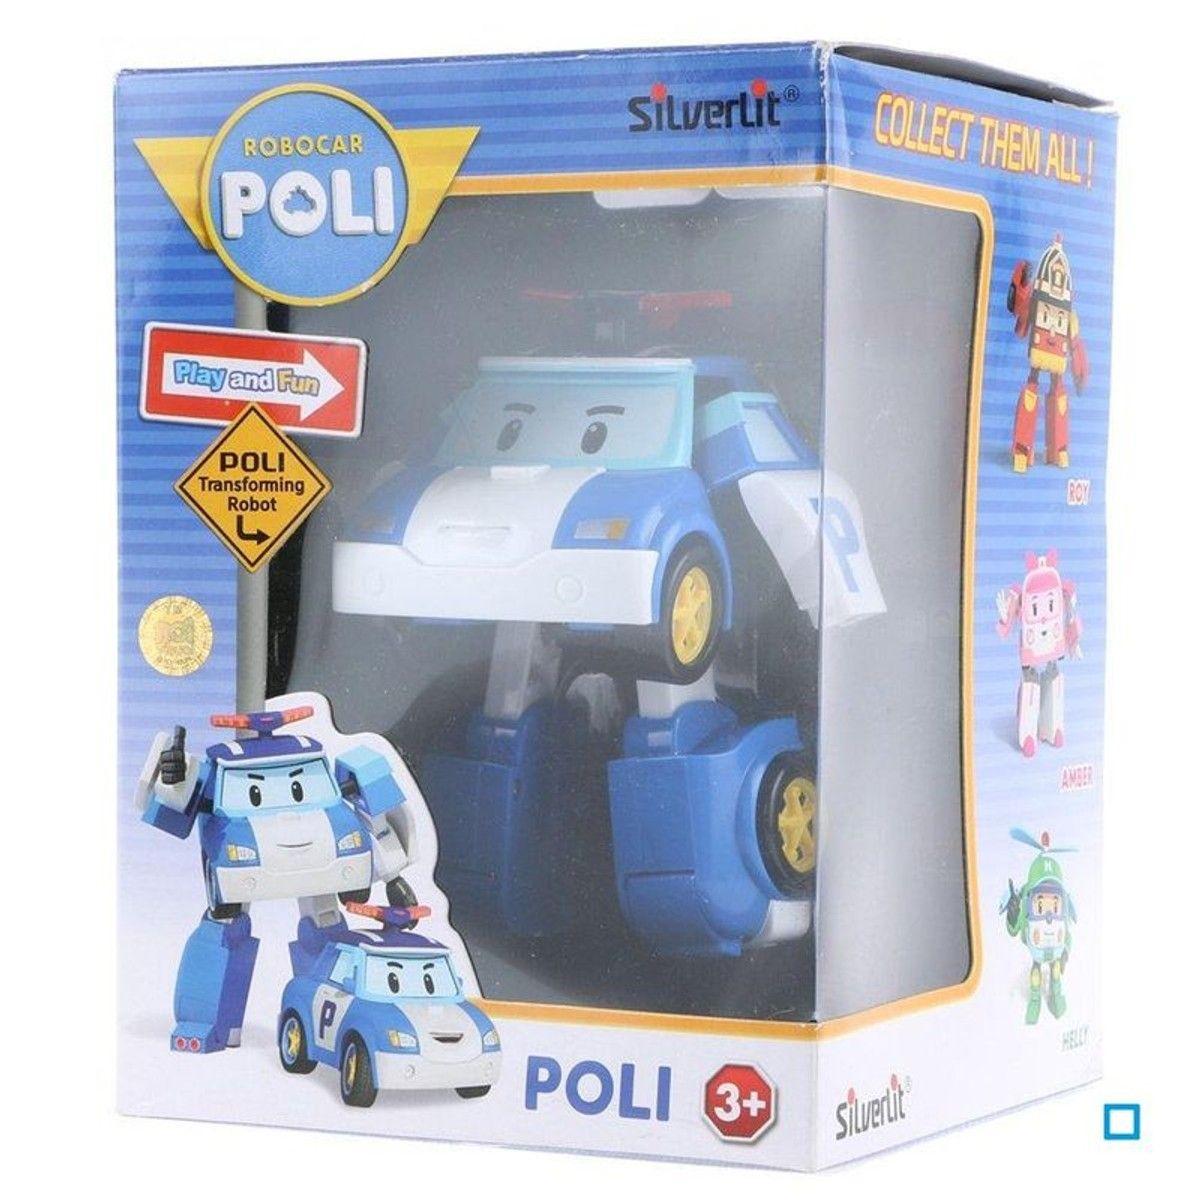 Robocar Sil83171 TailleTu Poli Véhicule Transformable gyYf7bI6v